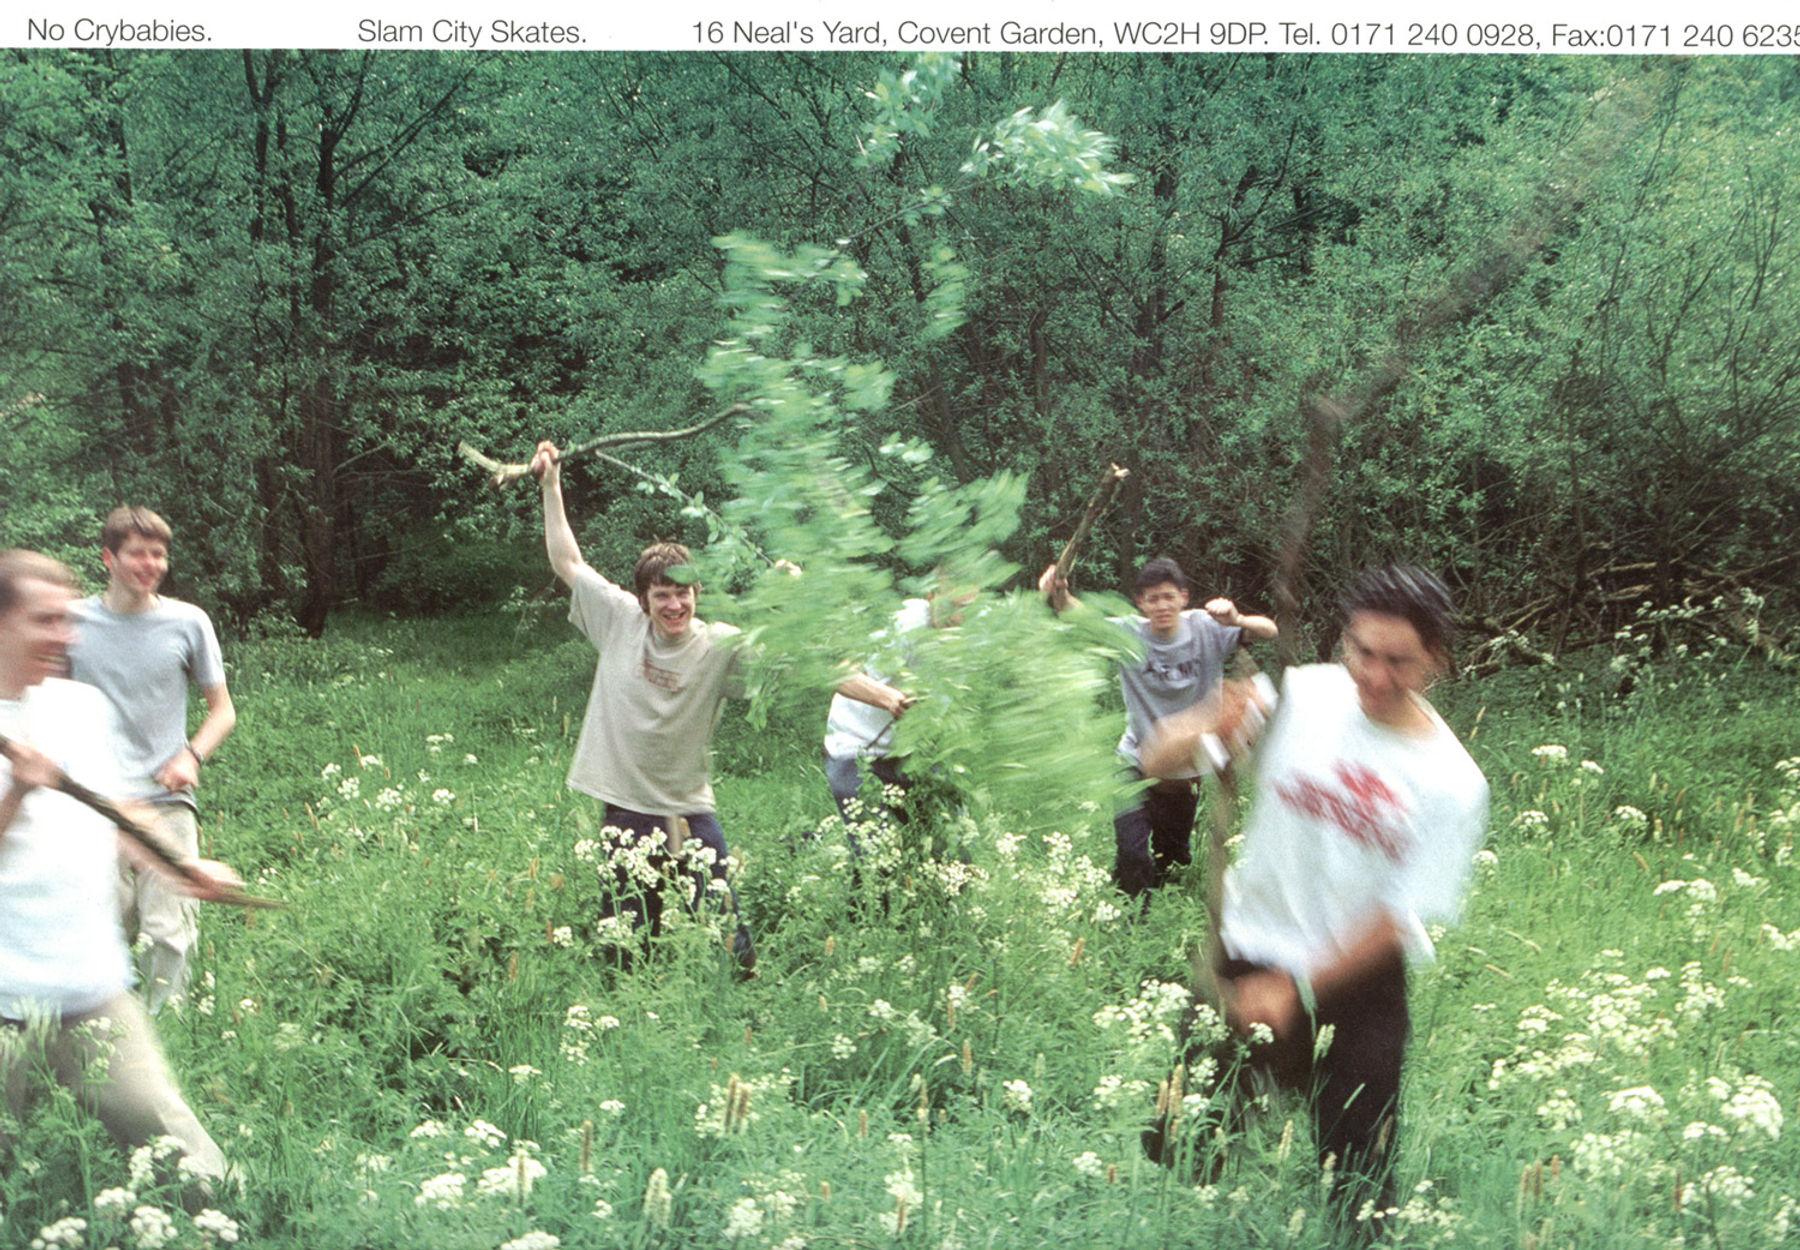 nocrybabies_slam_rad_summer_1995_RT